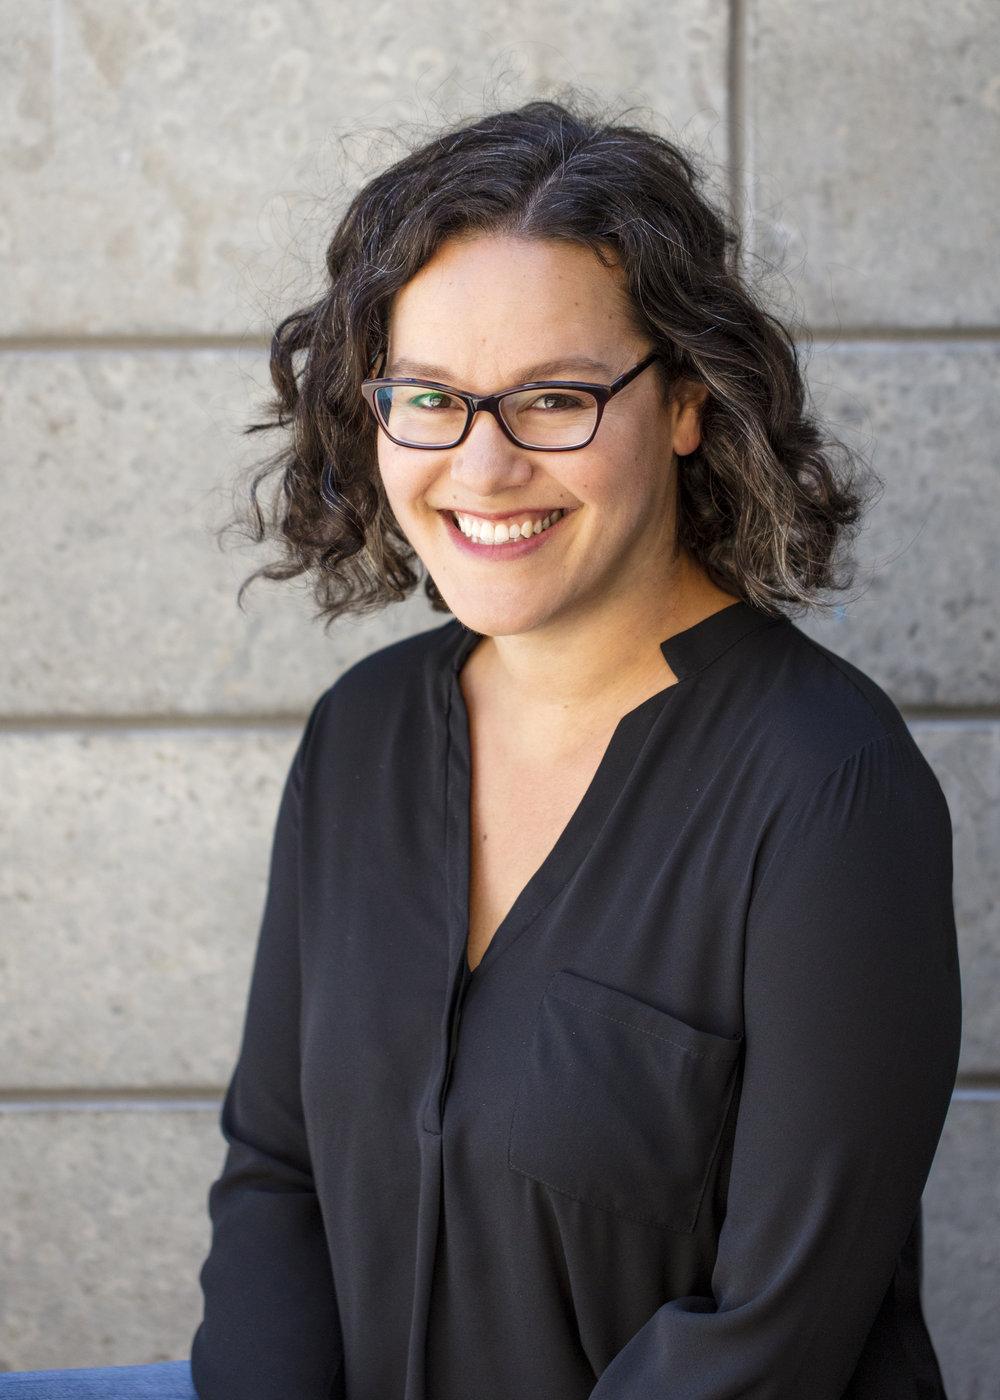 Maggie Hoffman